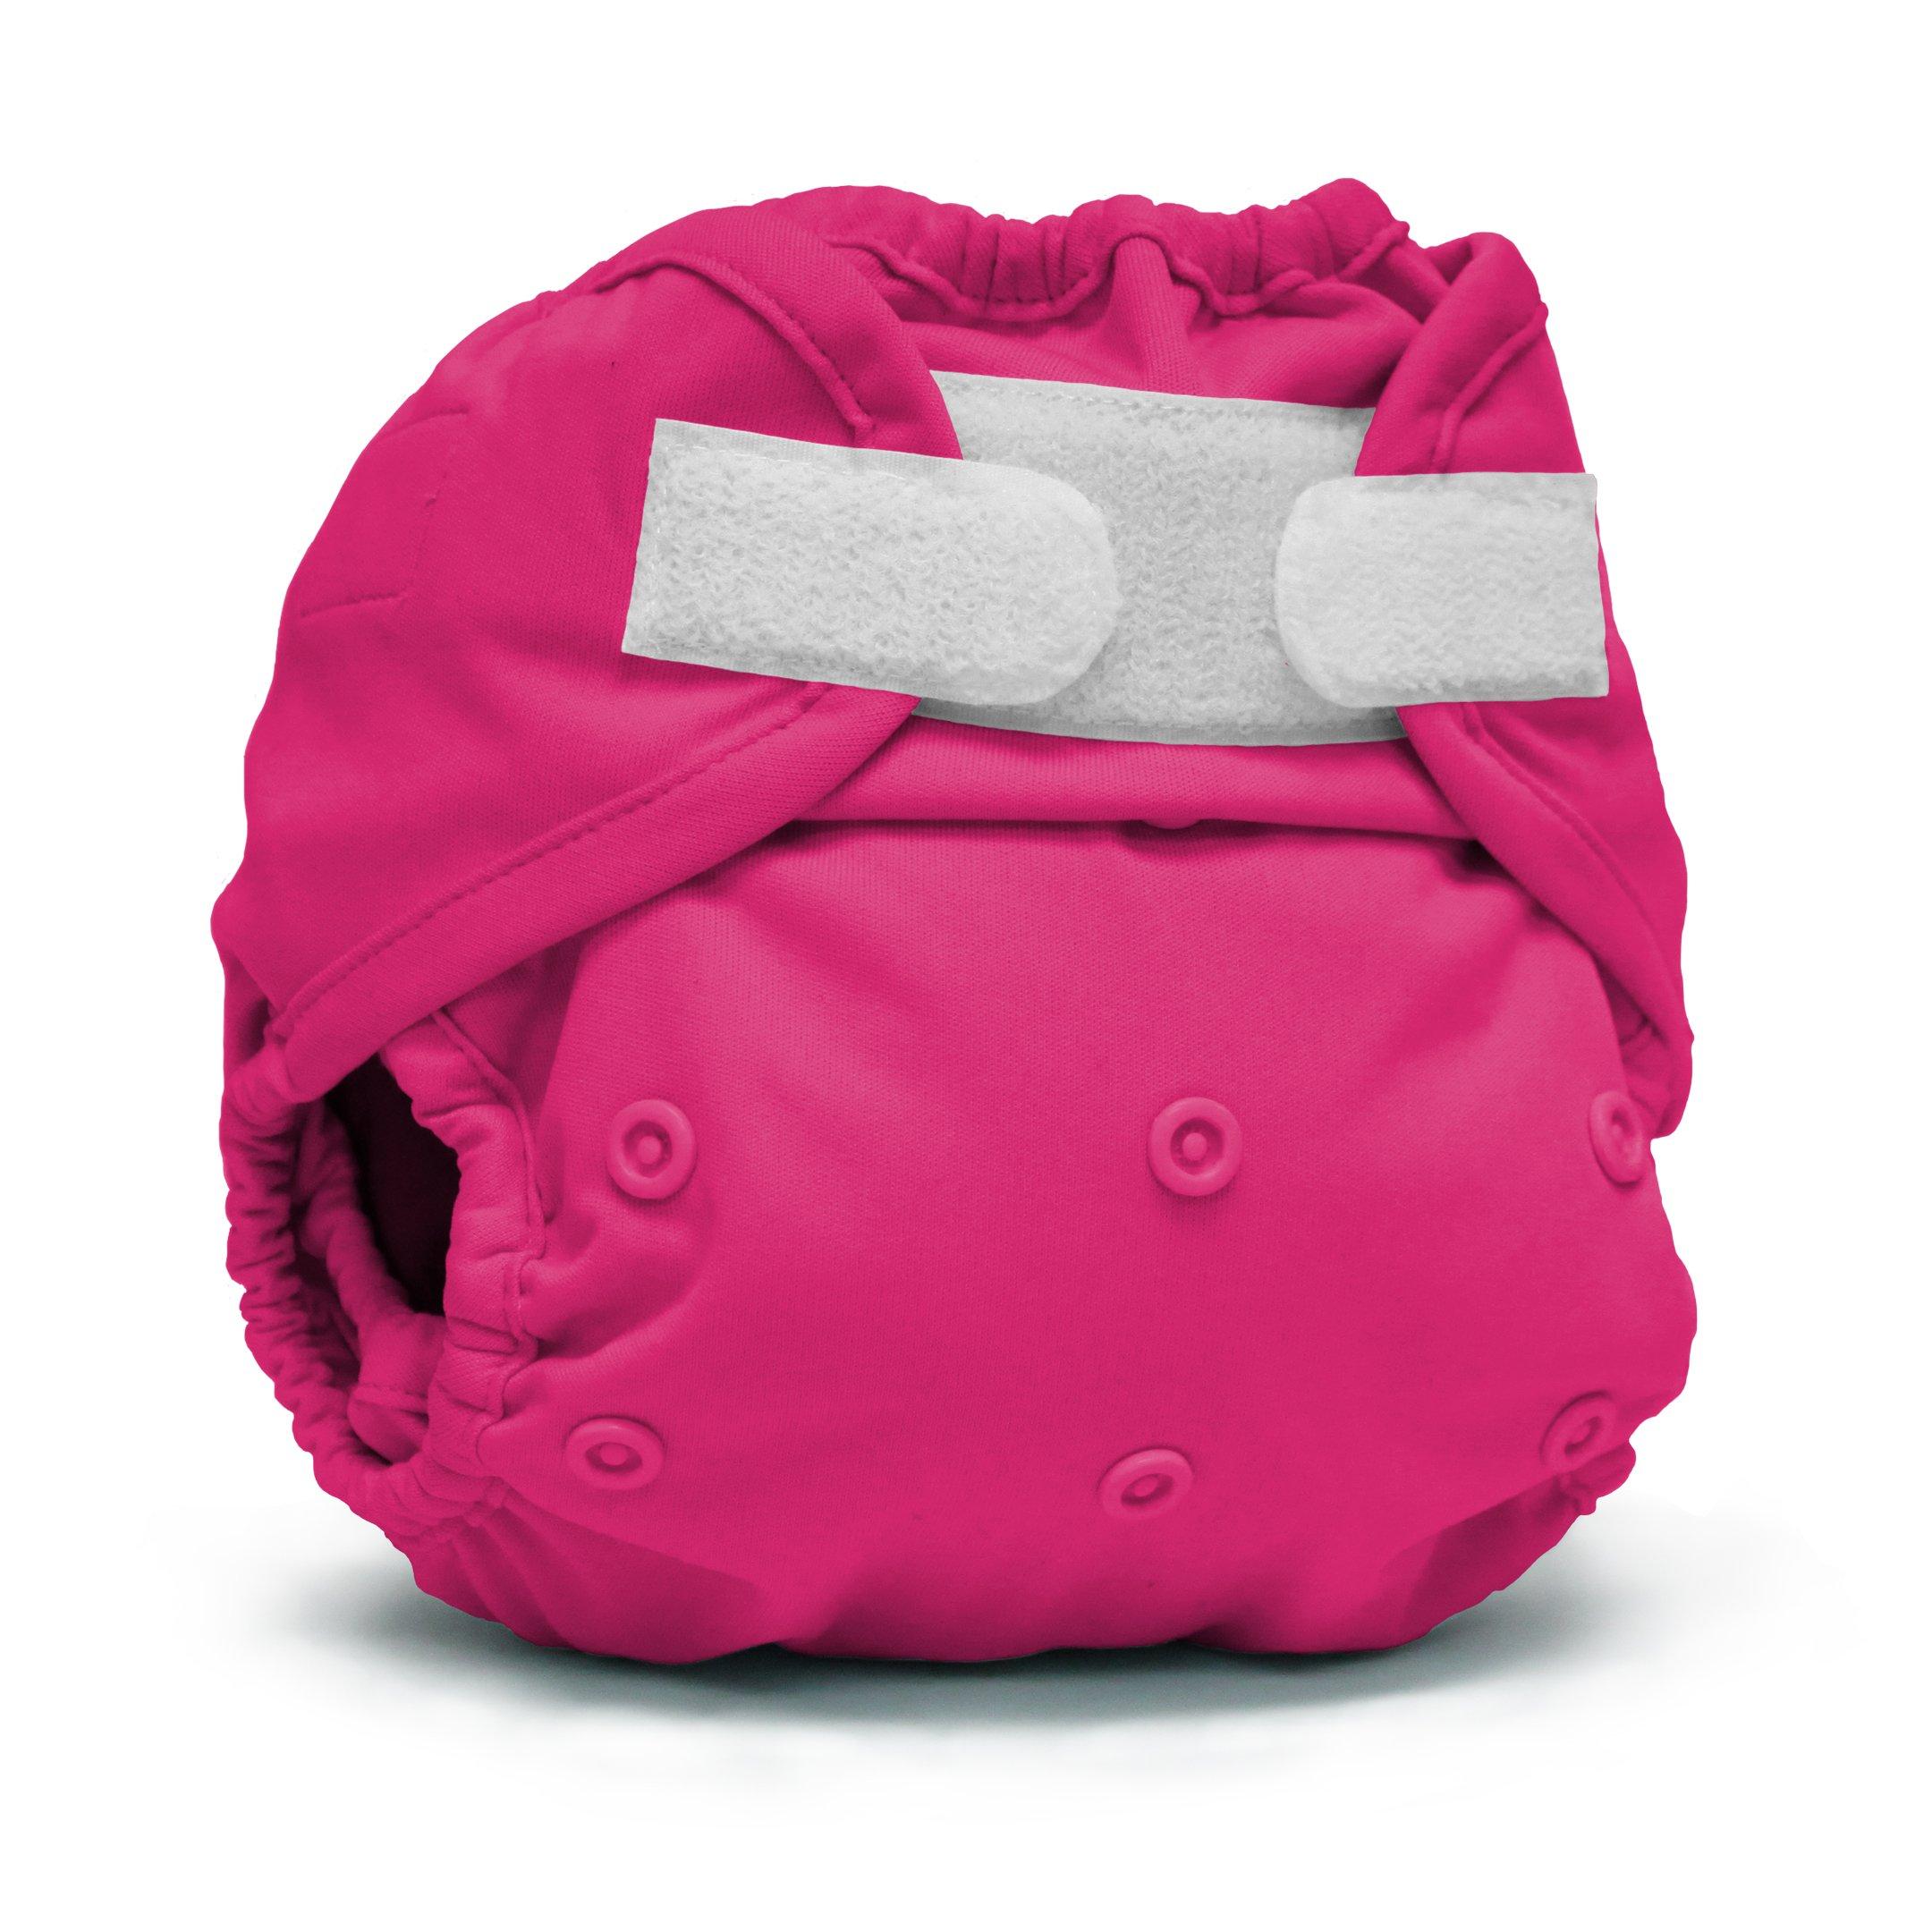 Kanga Care Rumparooz One Size Reusable Cloth Diaper Cover Aplix Sherbert 6-35 lbs